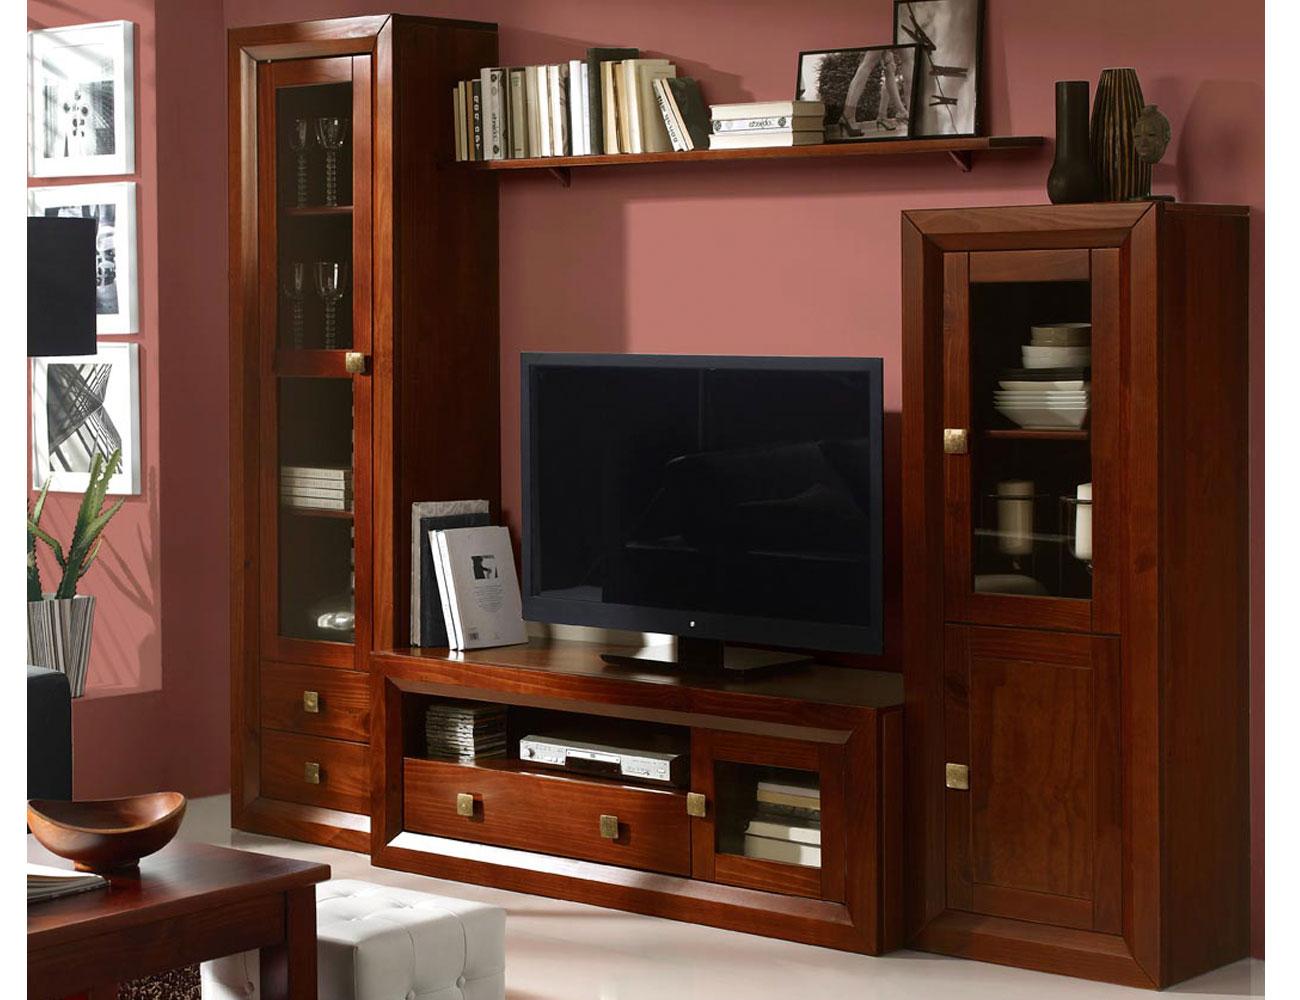 Muebles salon comedor nogal madera dm vitrina bodeguero tv4